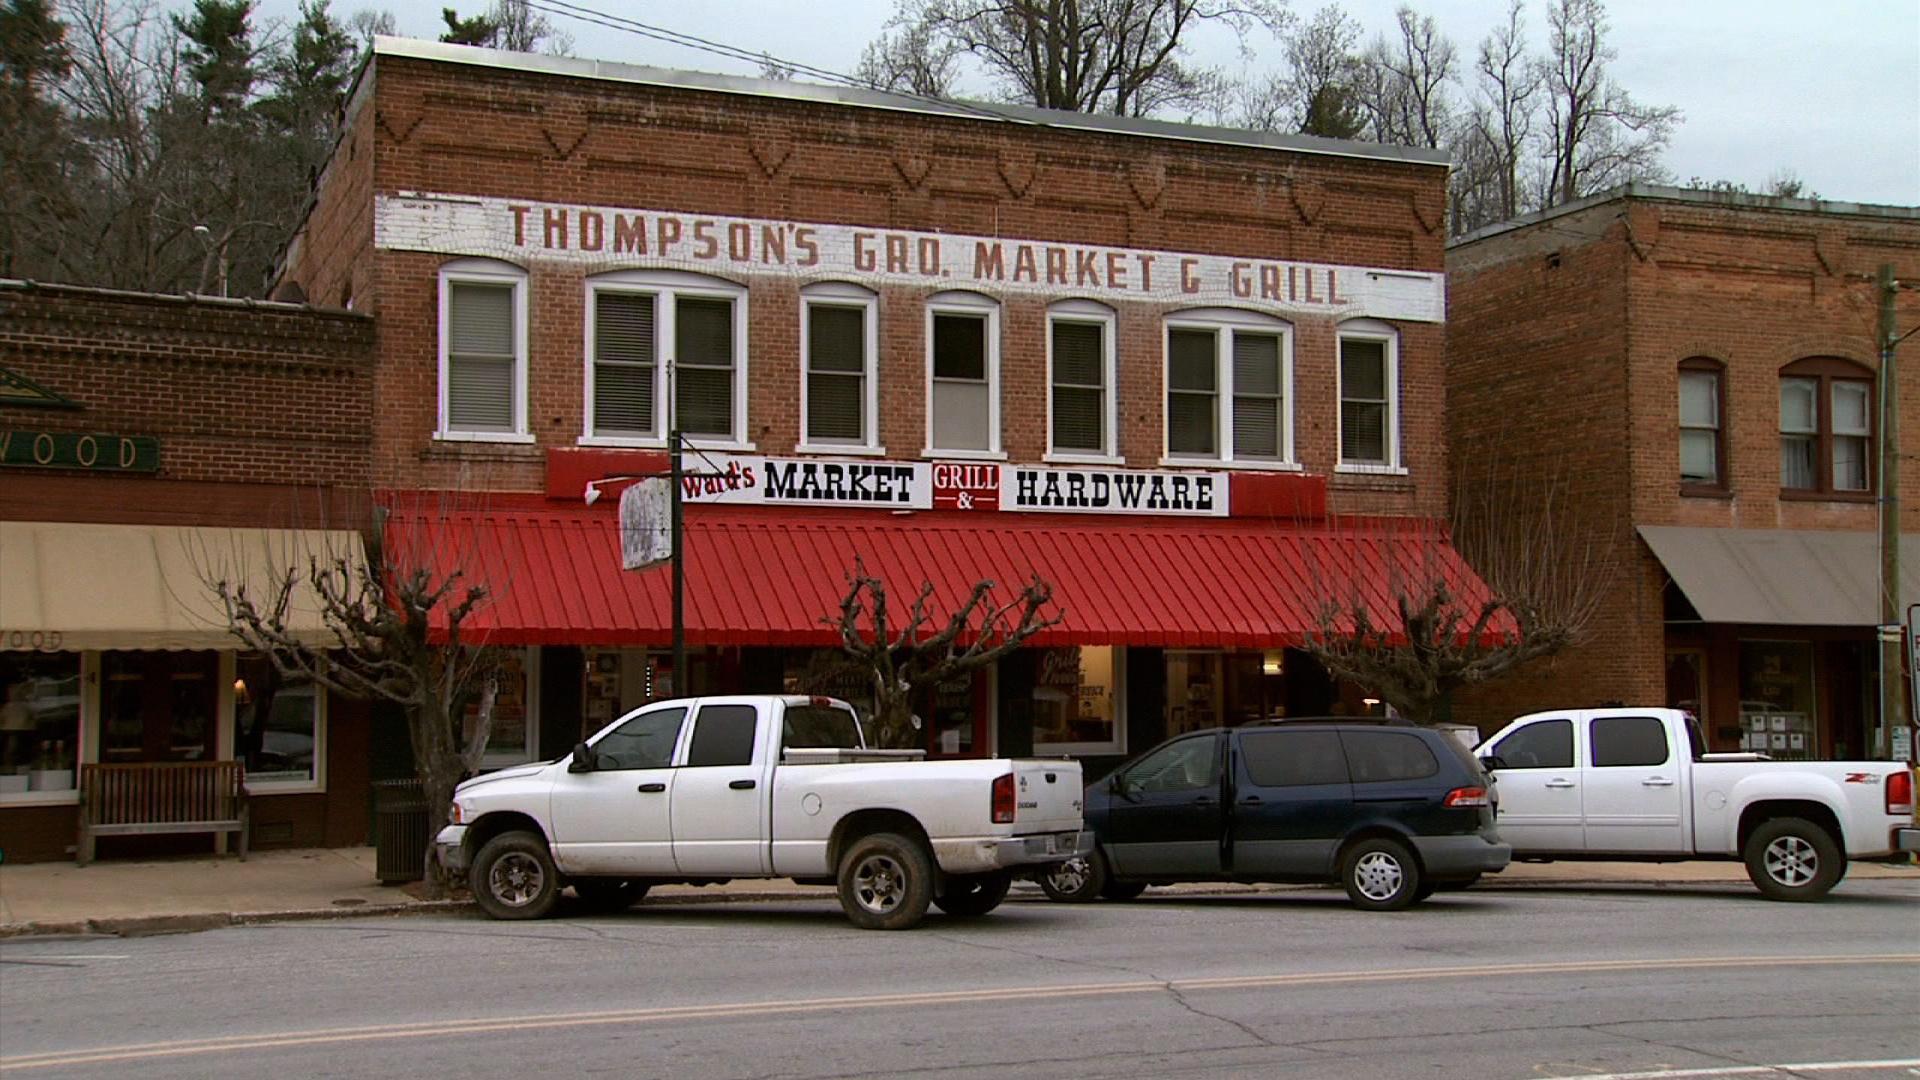 Thompson's Store image